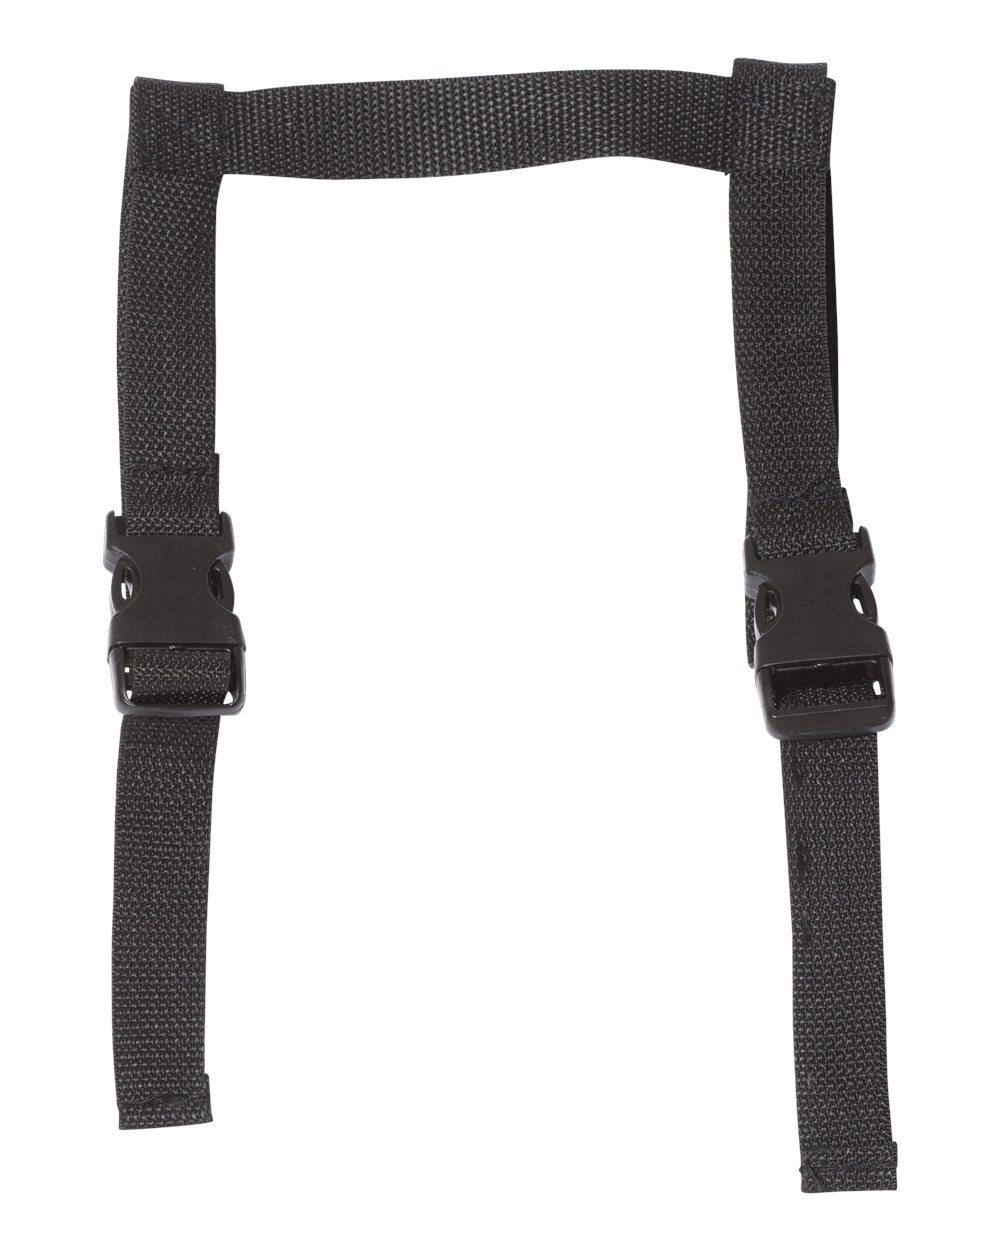 Liberty Bags 8820 - Alpine Fleece Blanket Strap